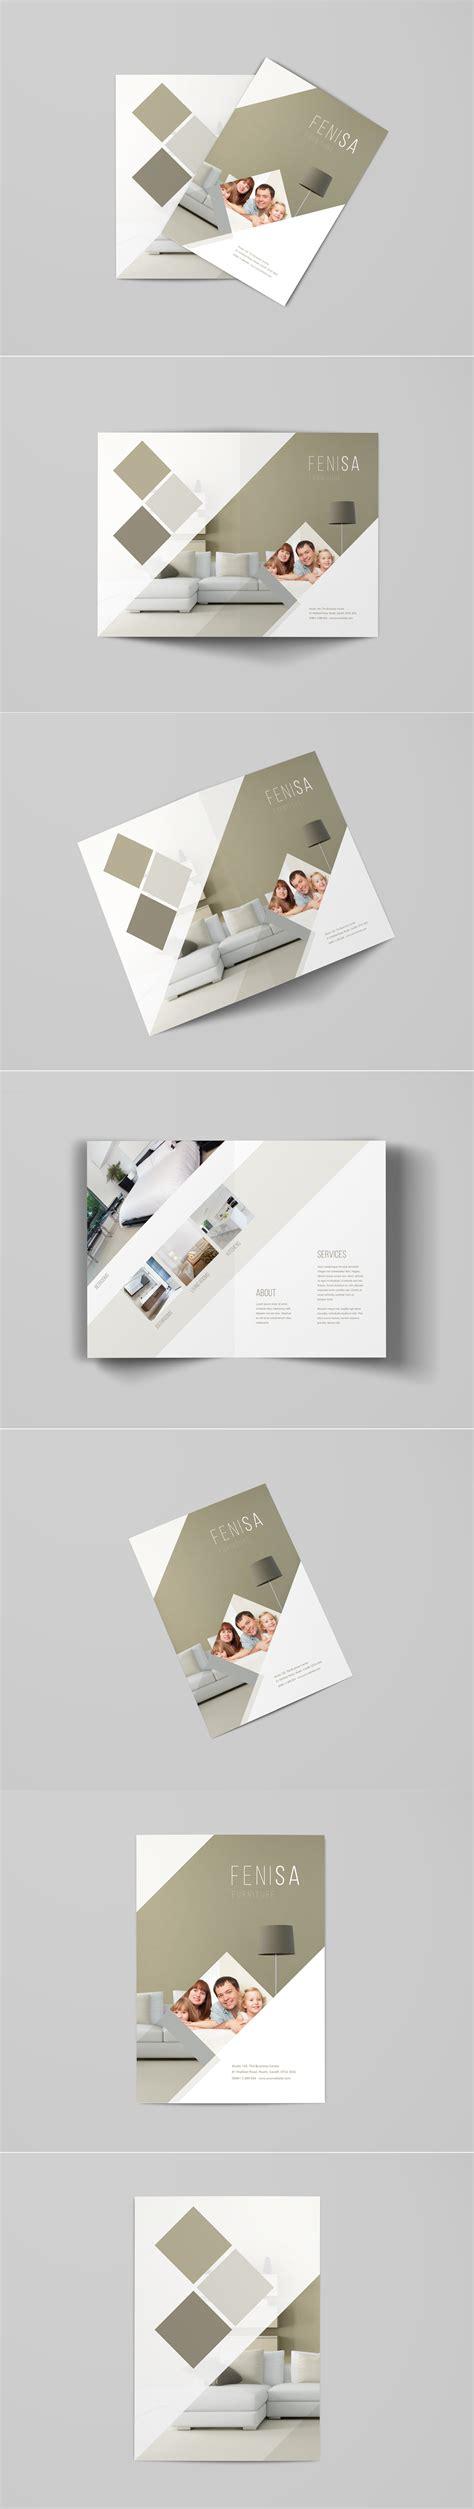 home design dimensions a4 bi fold brochure mockup